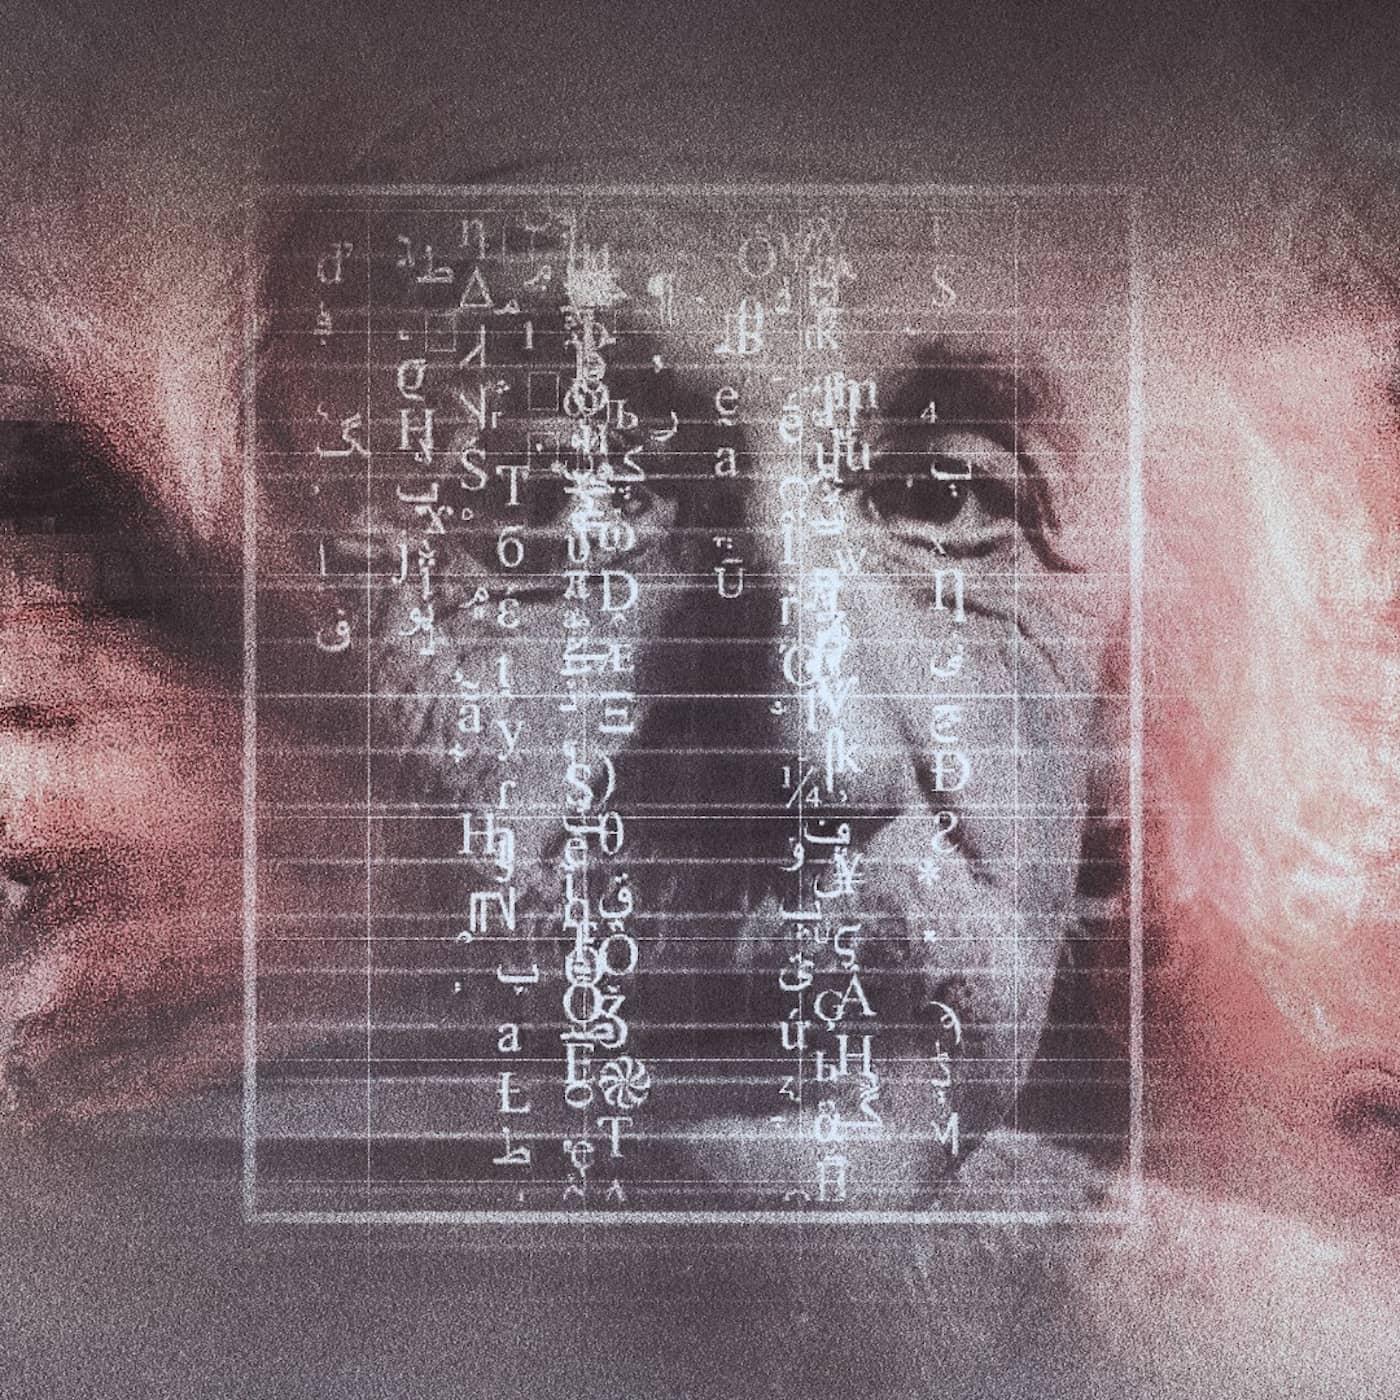 Teknokrati eller expertisens död?